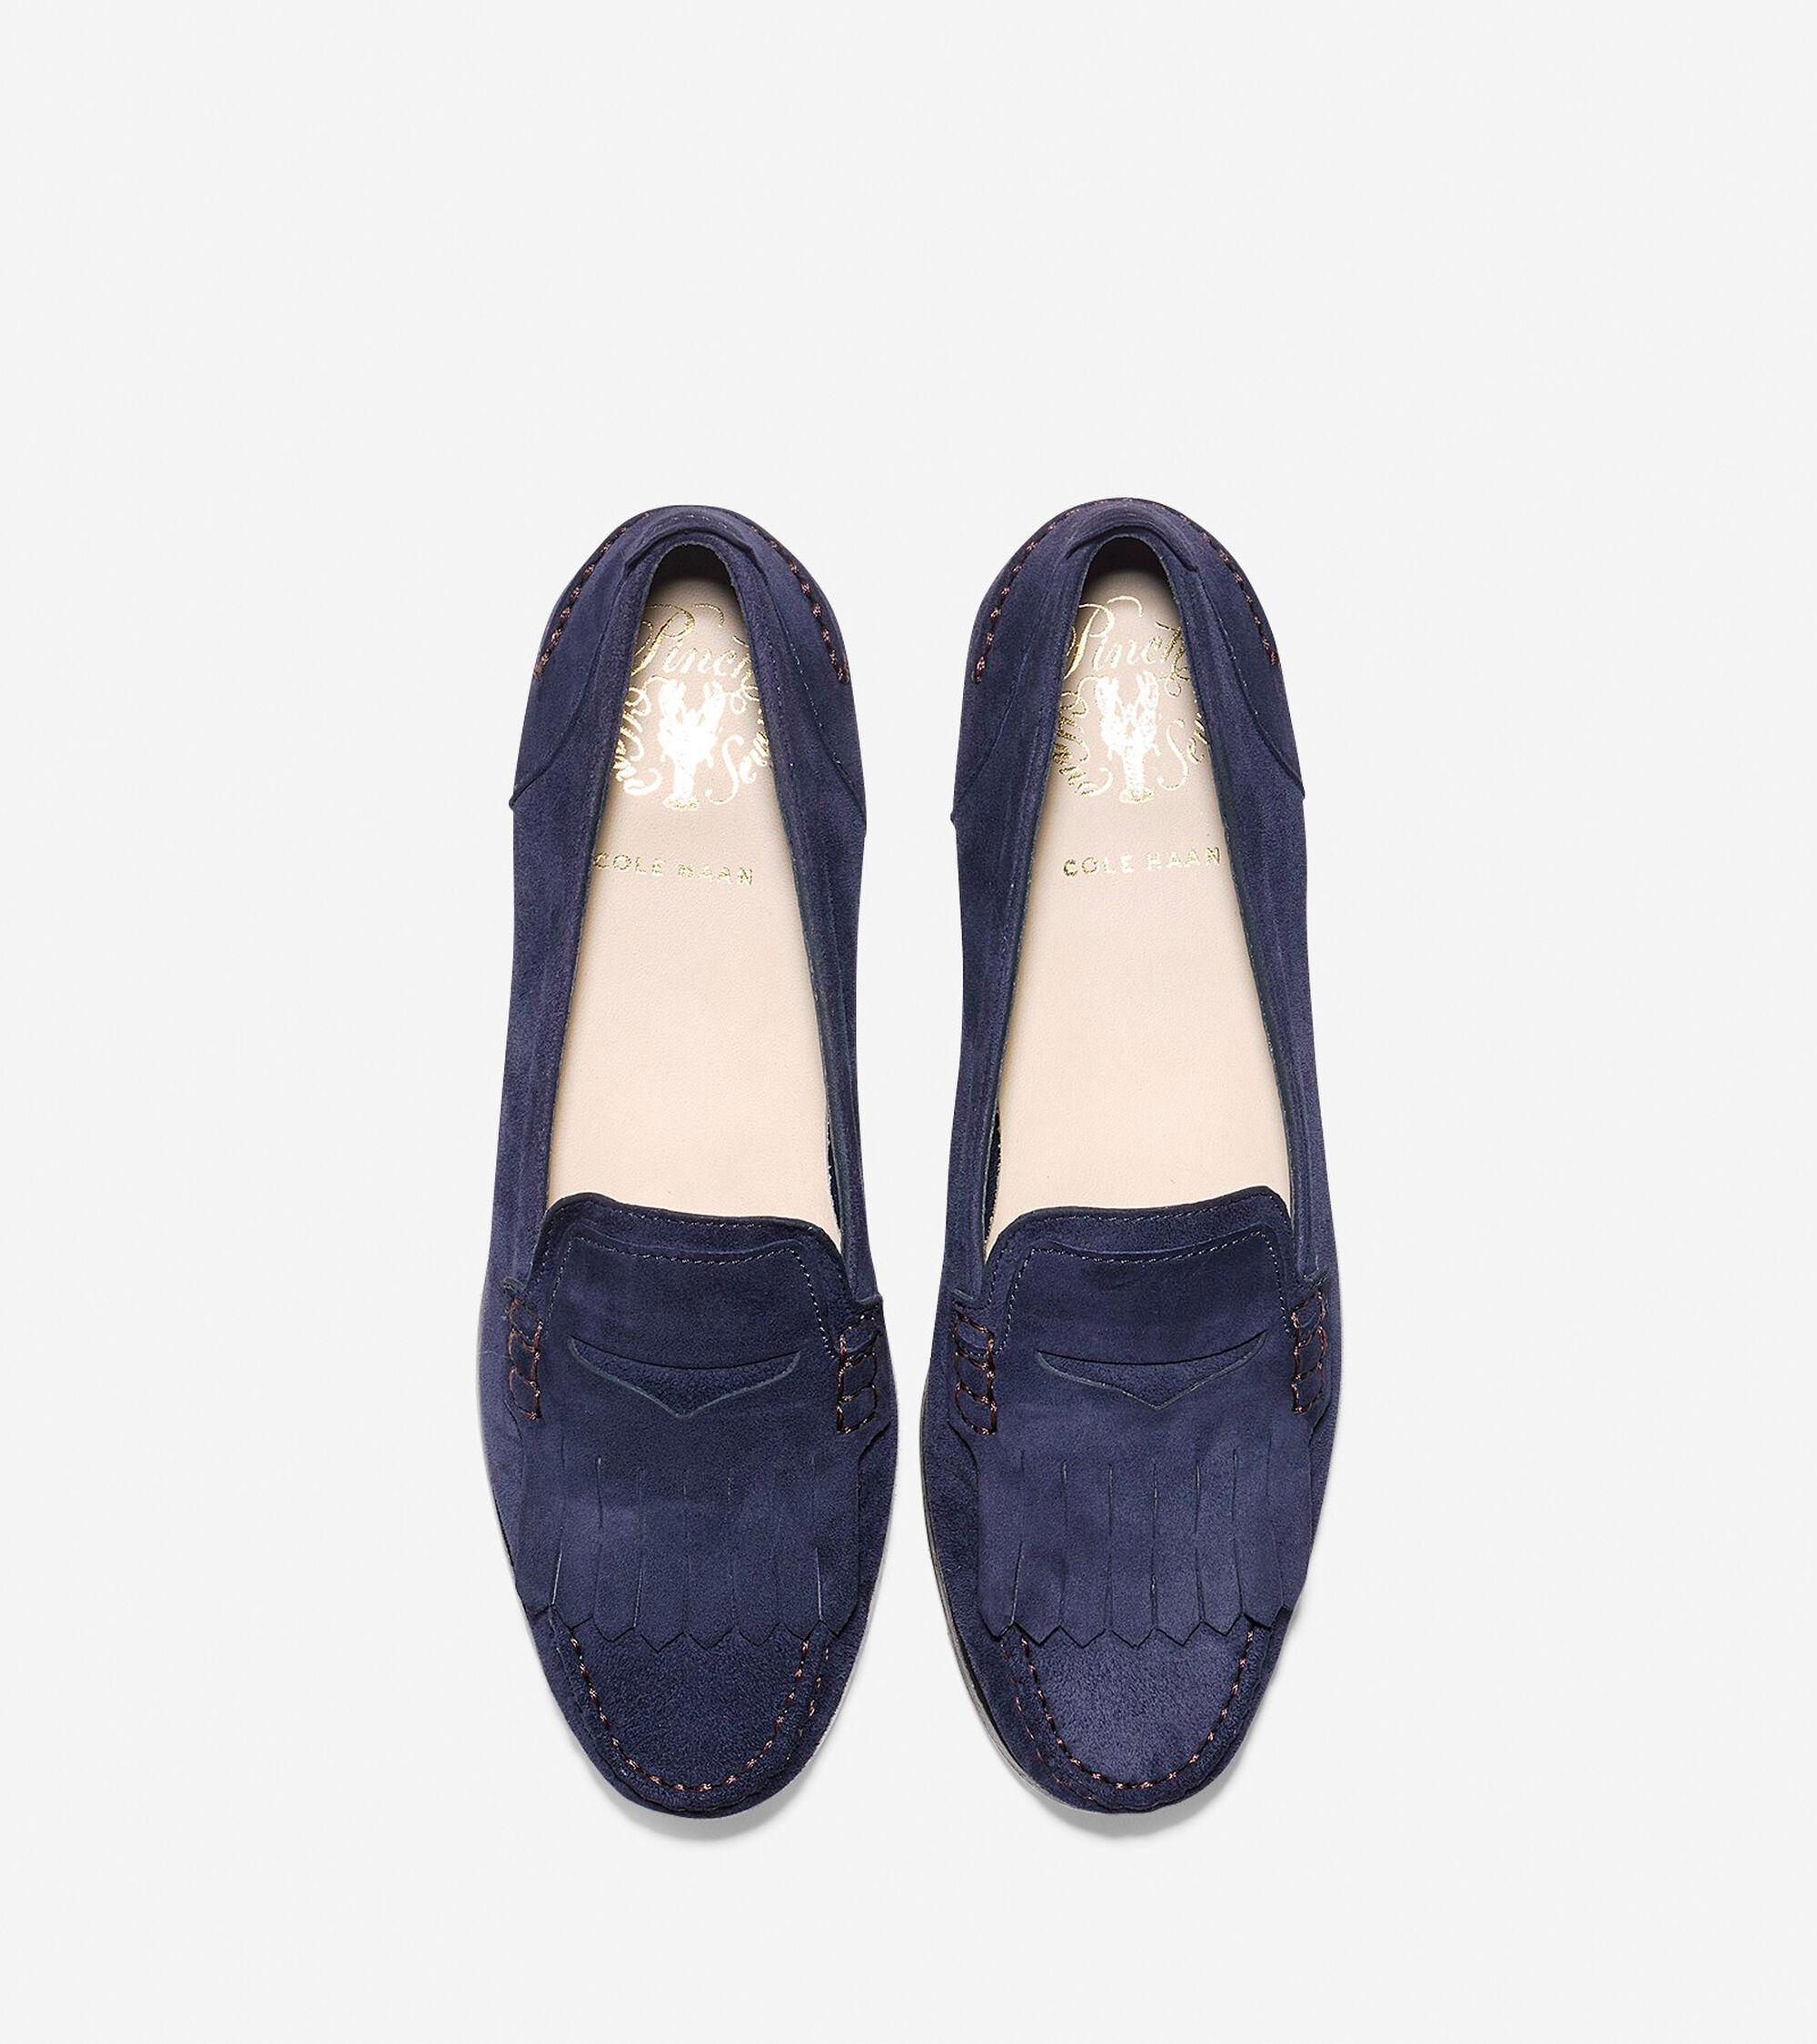 a6d28faebdd Women s Pinch Grand Kiltie Loafers in Marine Blue